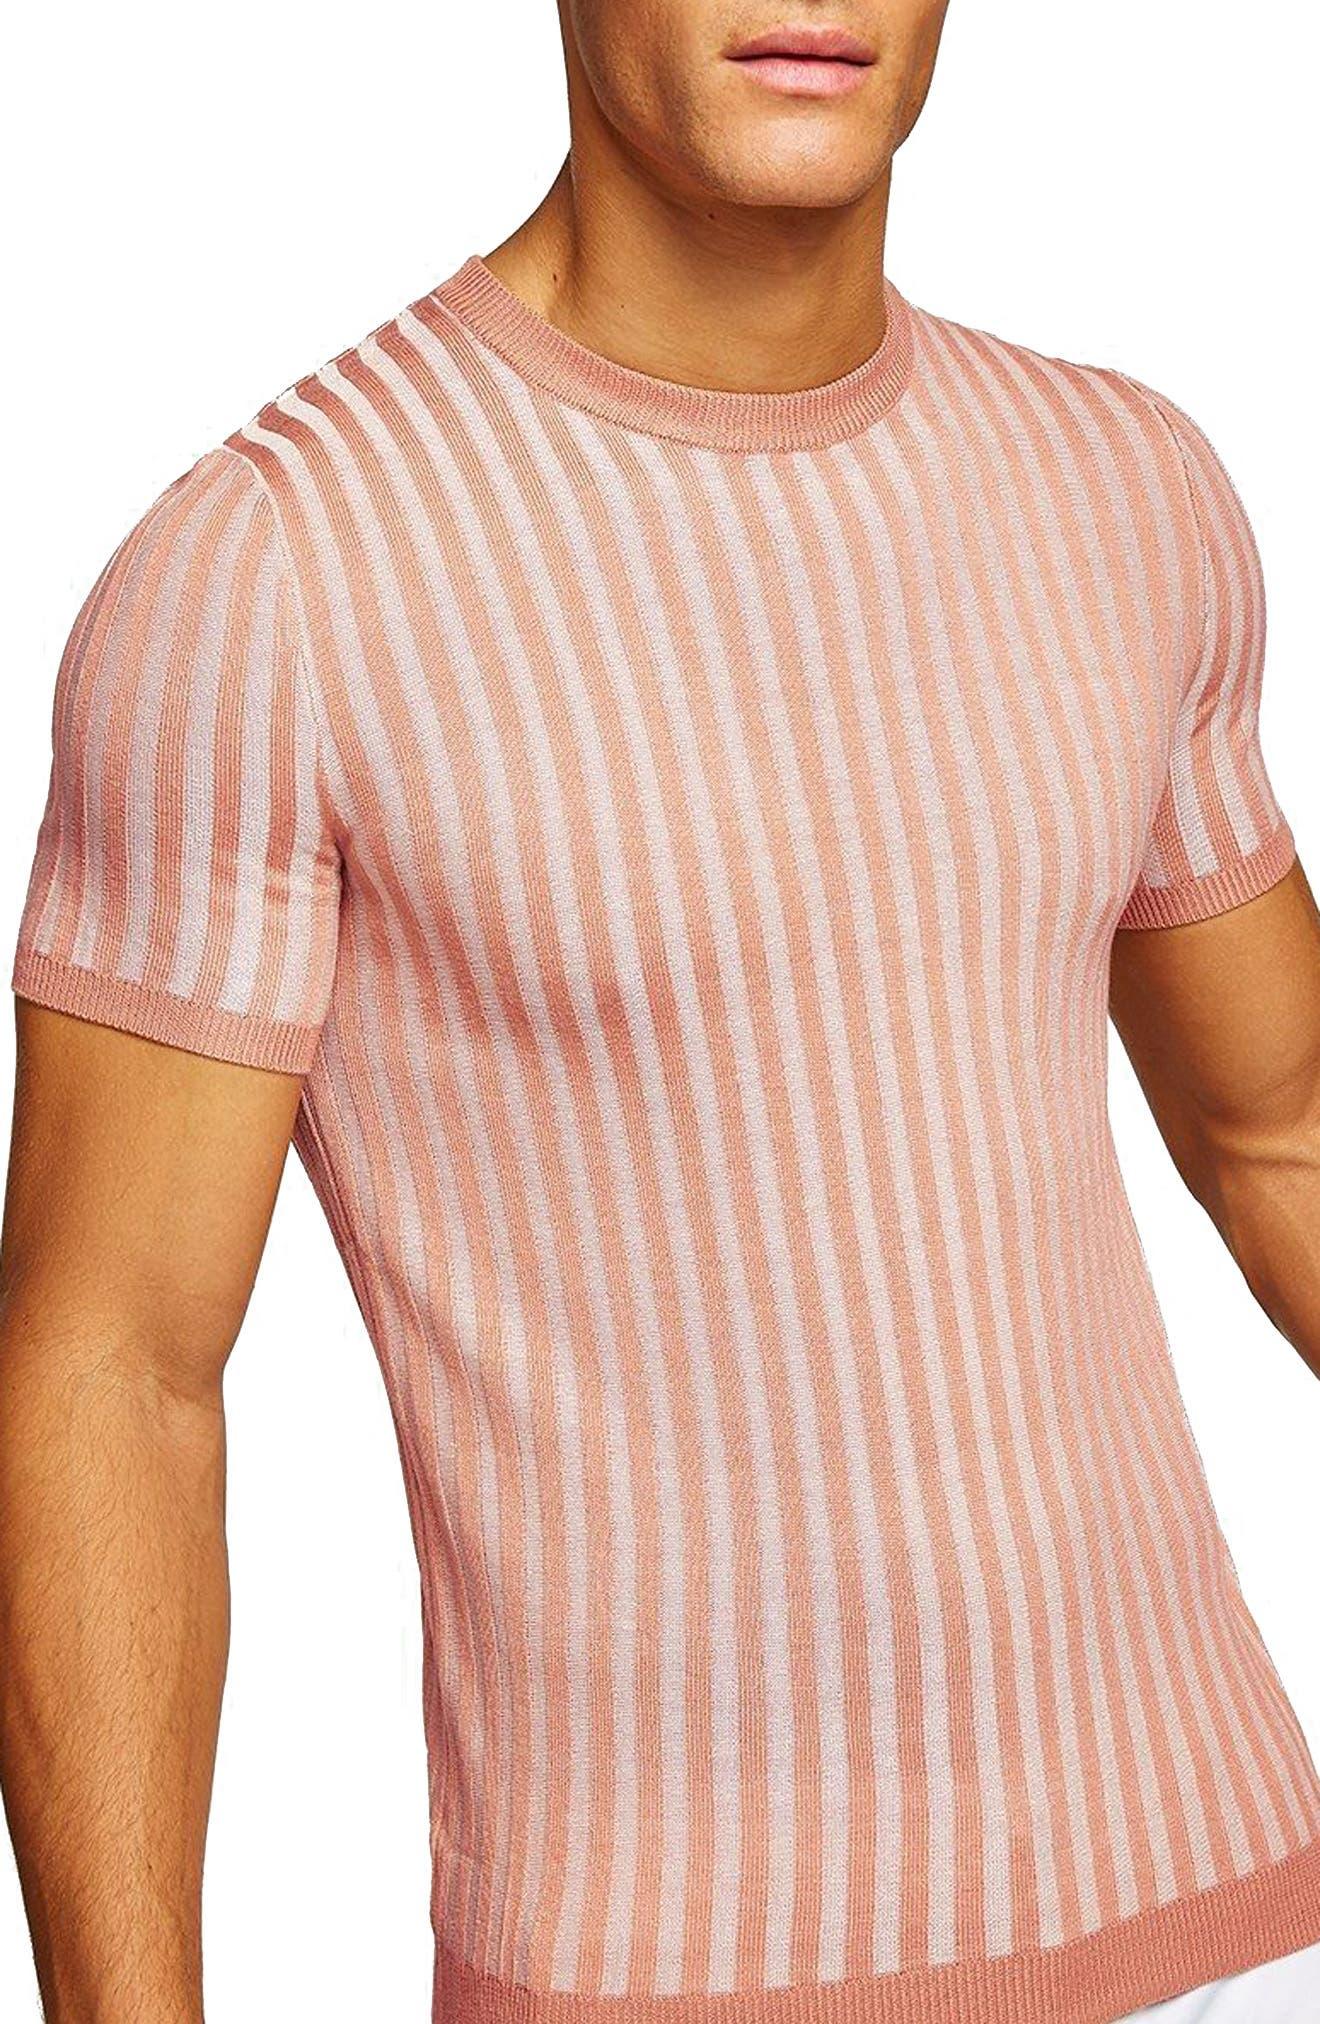 Muscle Fit Ribbed T-Shirt,                             Main thumbnail 1, color,                             Pink